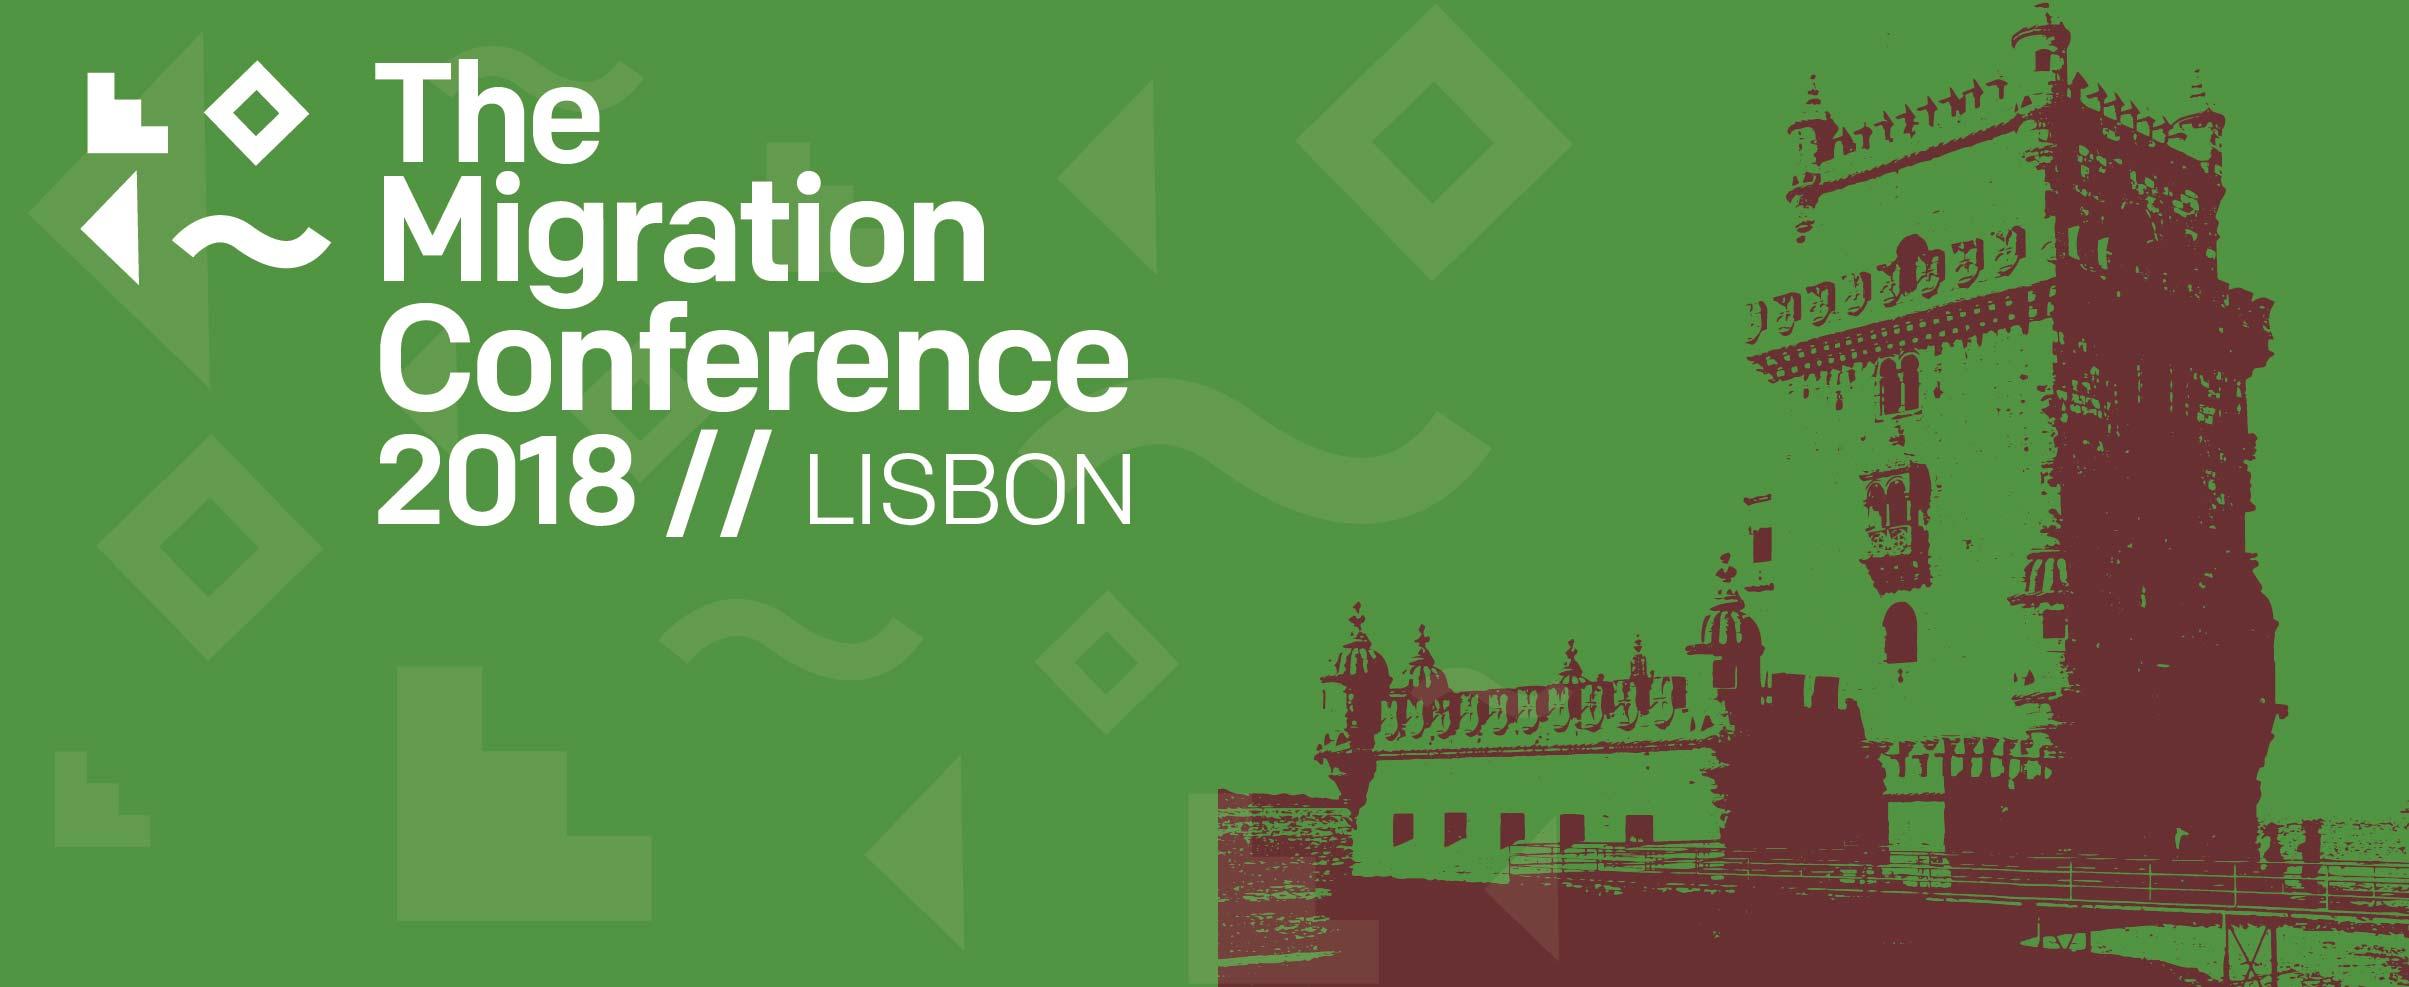 The Migration Conference 2018 Lisbon